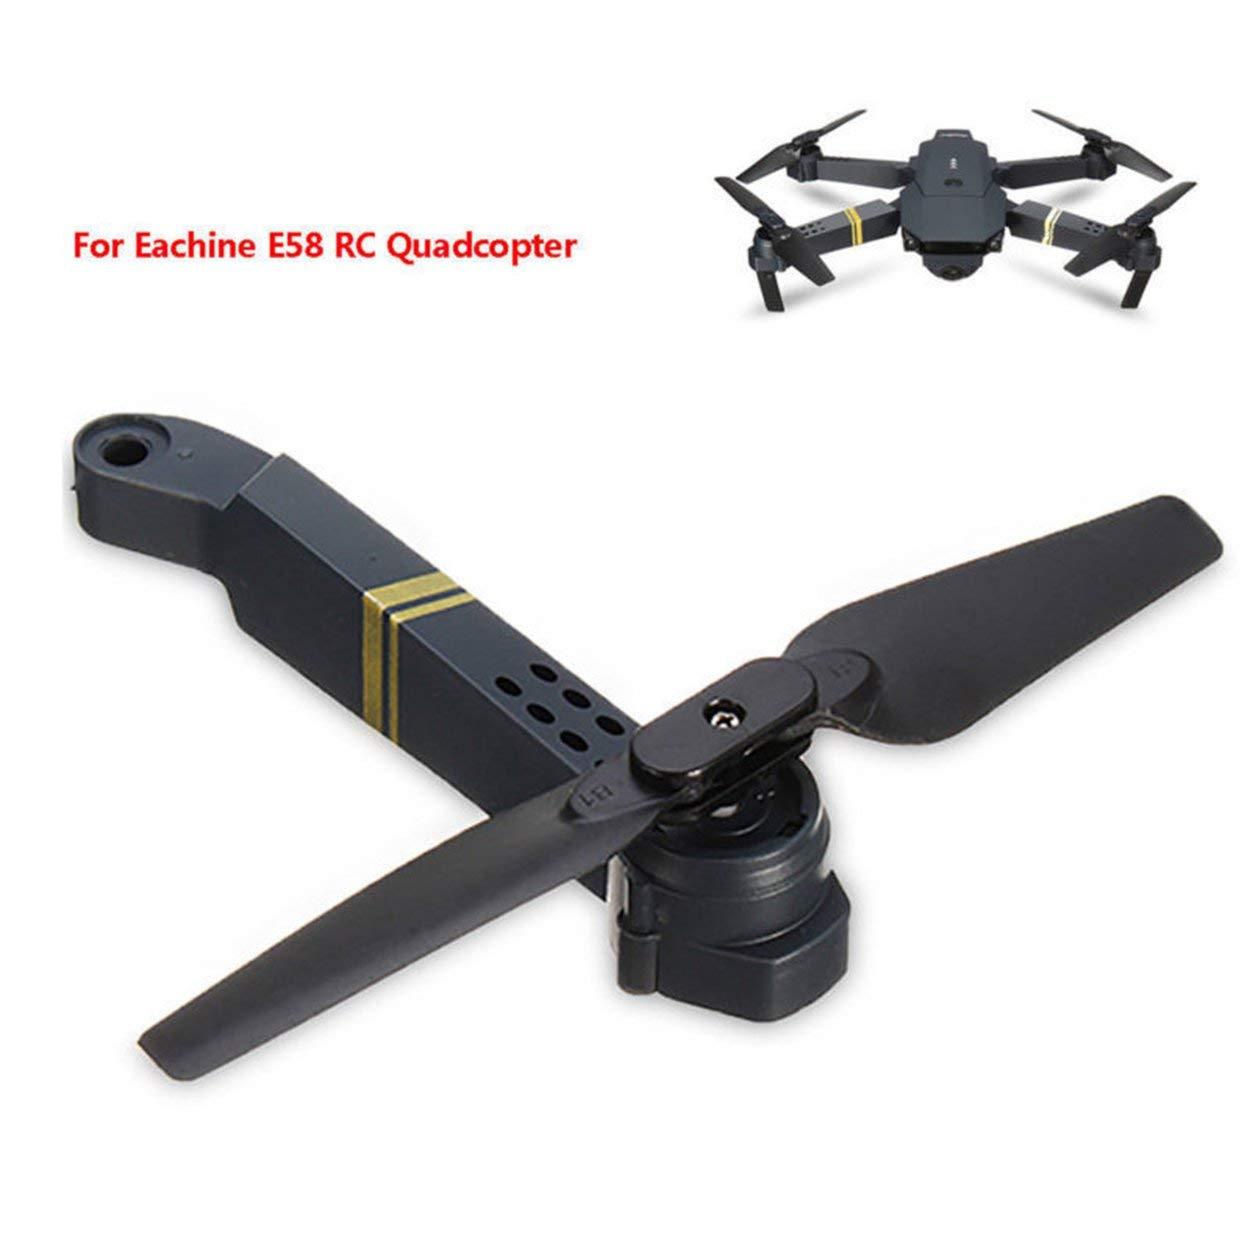 Lorenlli Profesional F/ácil de Instalar E58 WiFi FPV RC Quadcopter Eje Brazo Repuestos con Motor y h/élice Suministros